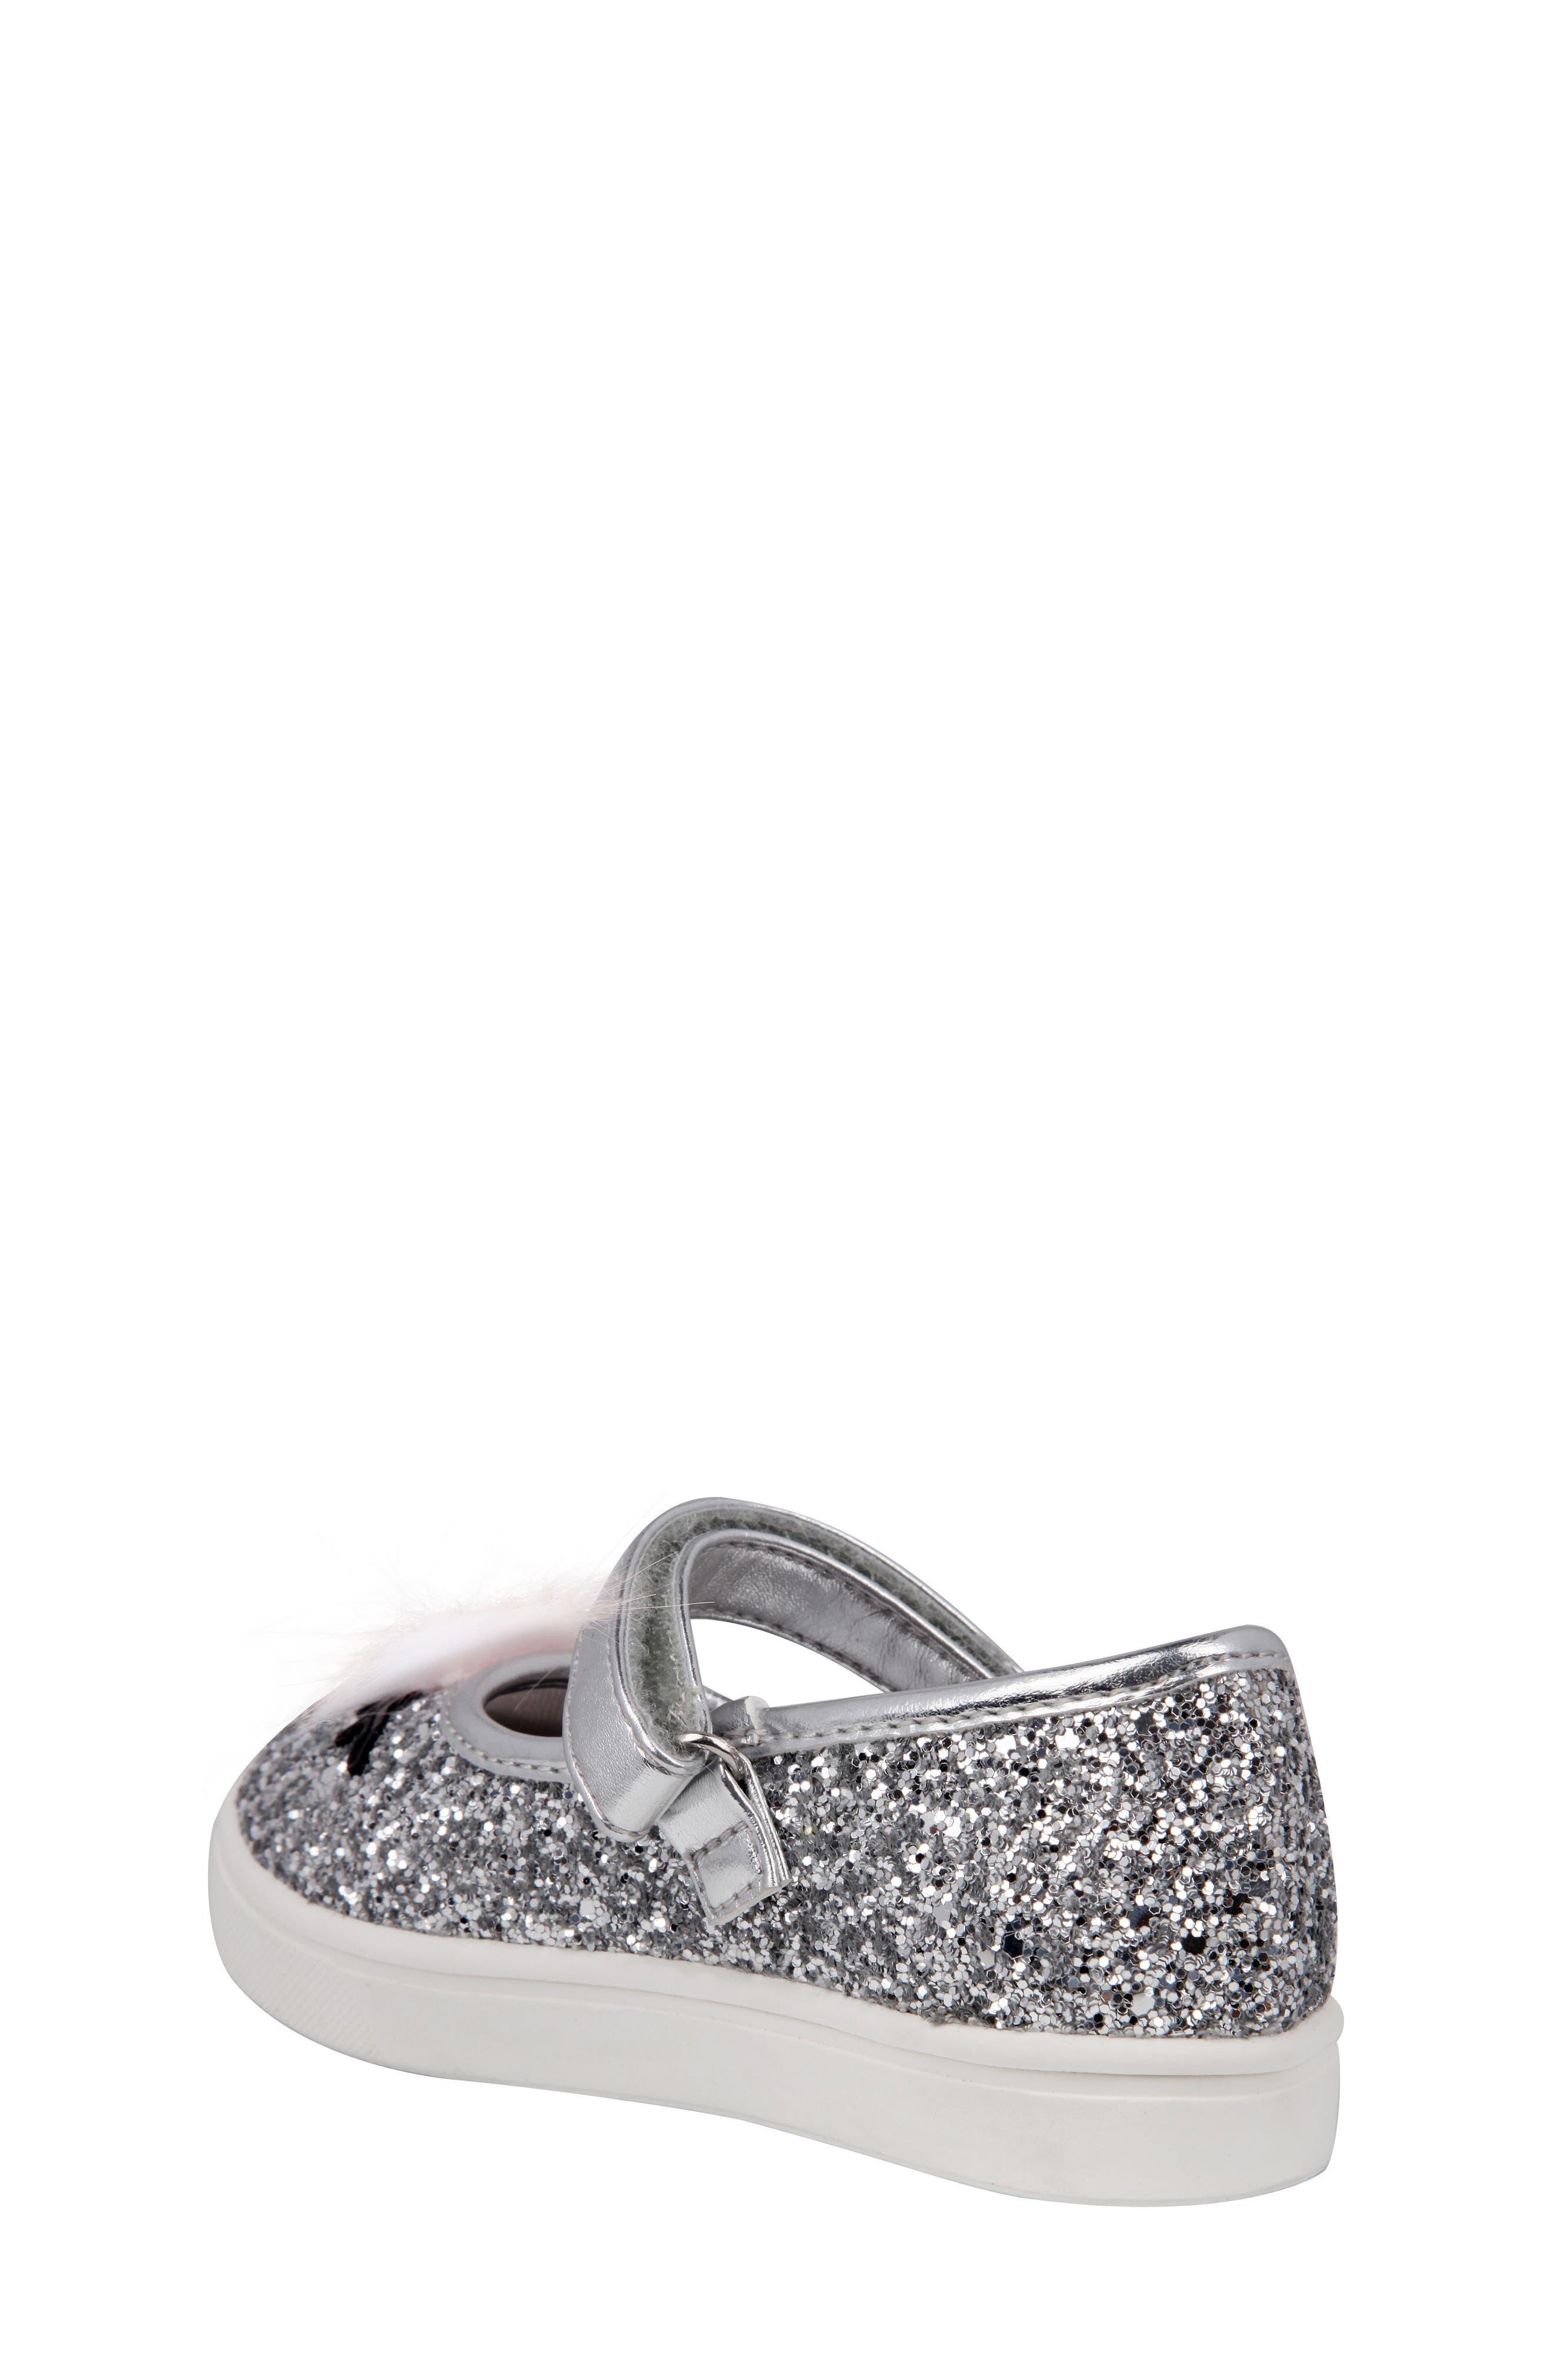 Ragina Faux Fur Glitter Mary Jane Sneaker,                             Alternate thumbnail 2, color,                             046